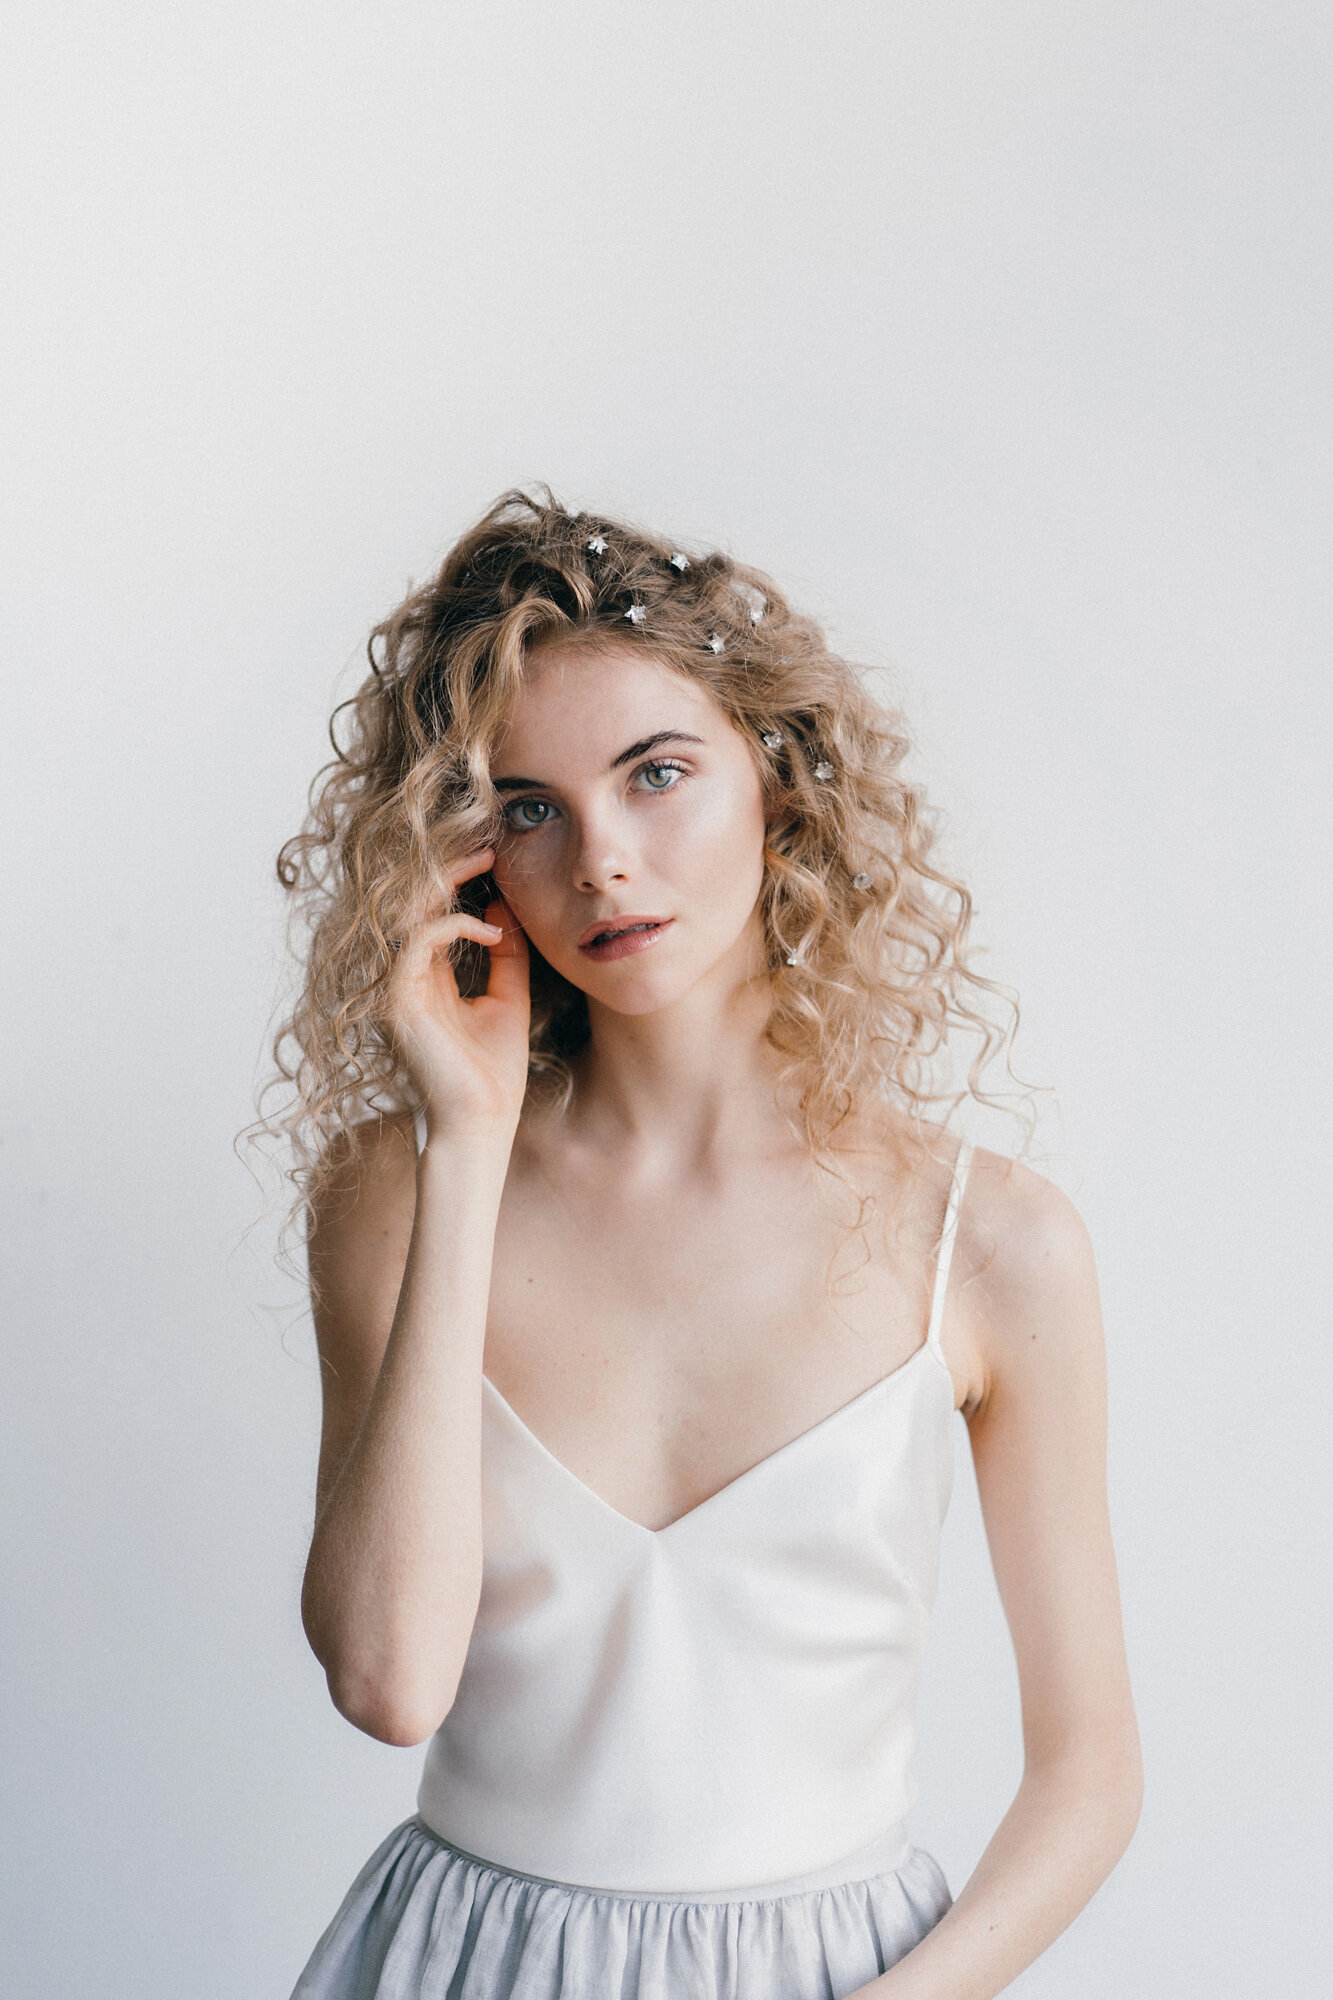 Debbie-Carlisle-Bridal-Accessories-Kate-Beaumont-Wedding-Gowns-Sheffield-Yorkshire-UK-29.jpg